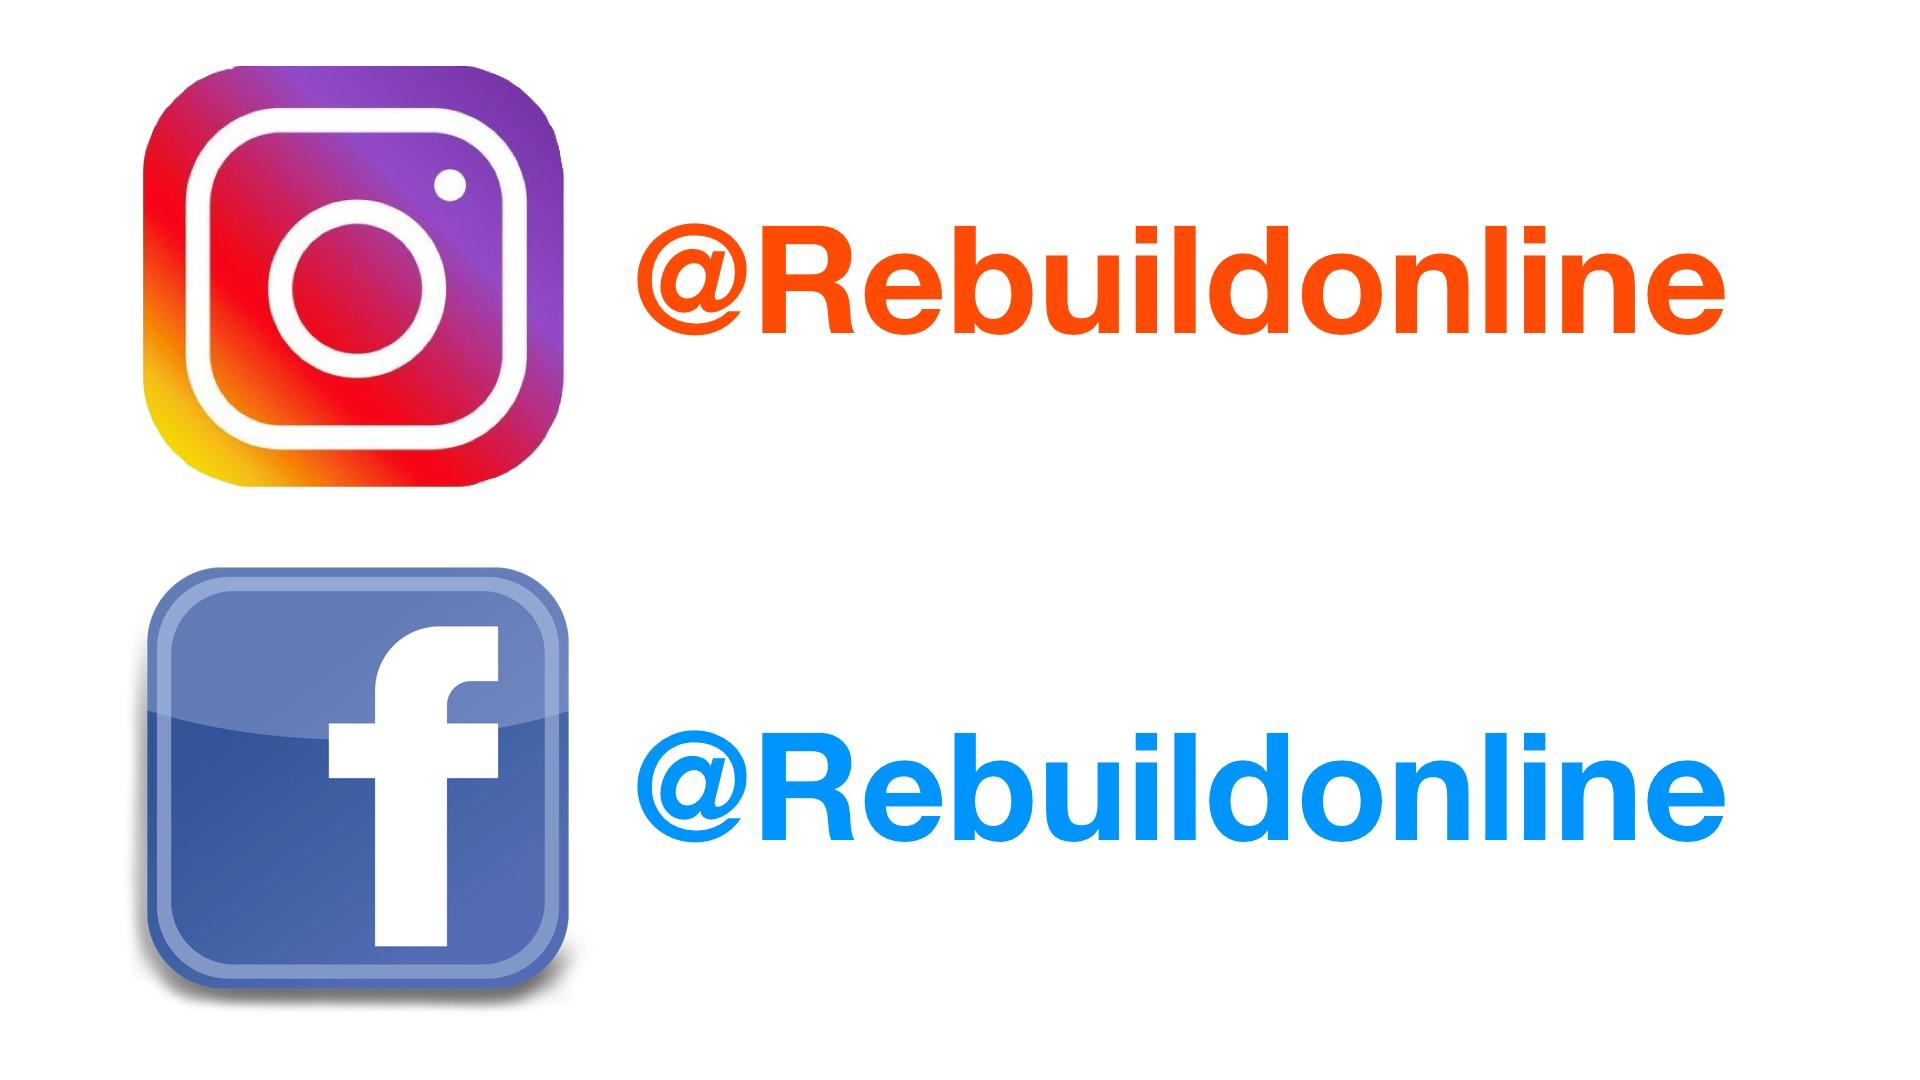 rebuildonline